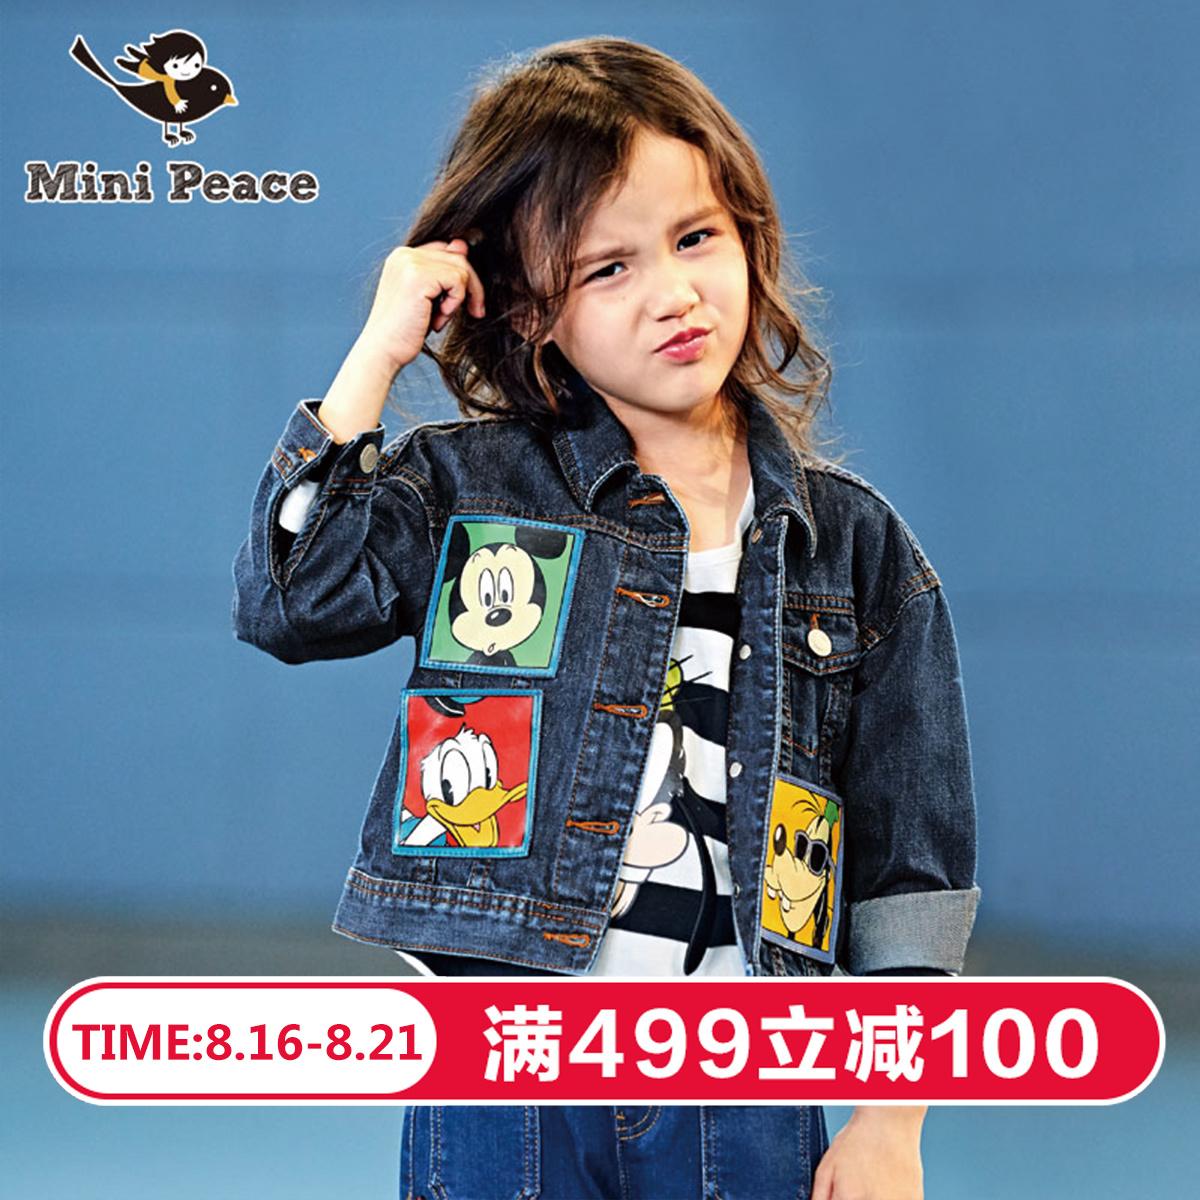 детская куртка Mini peace f2bc63d39 Minipeace 2017